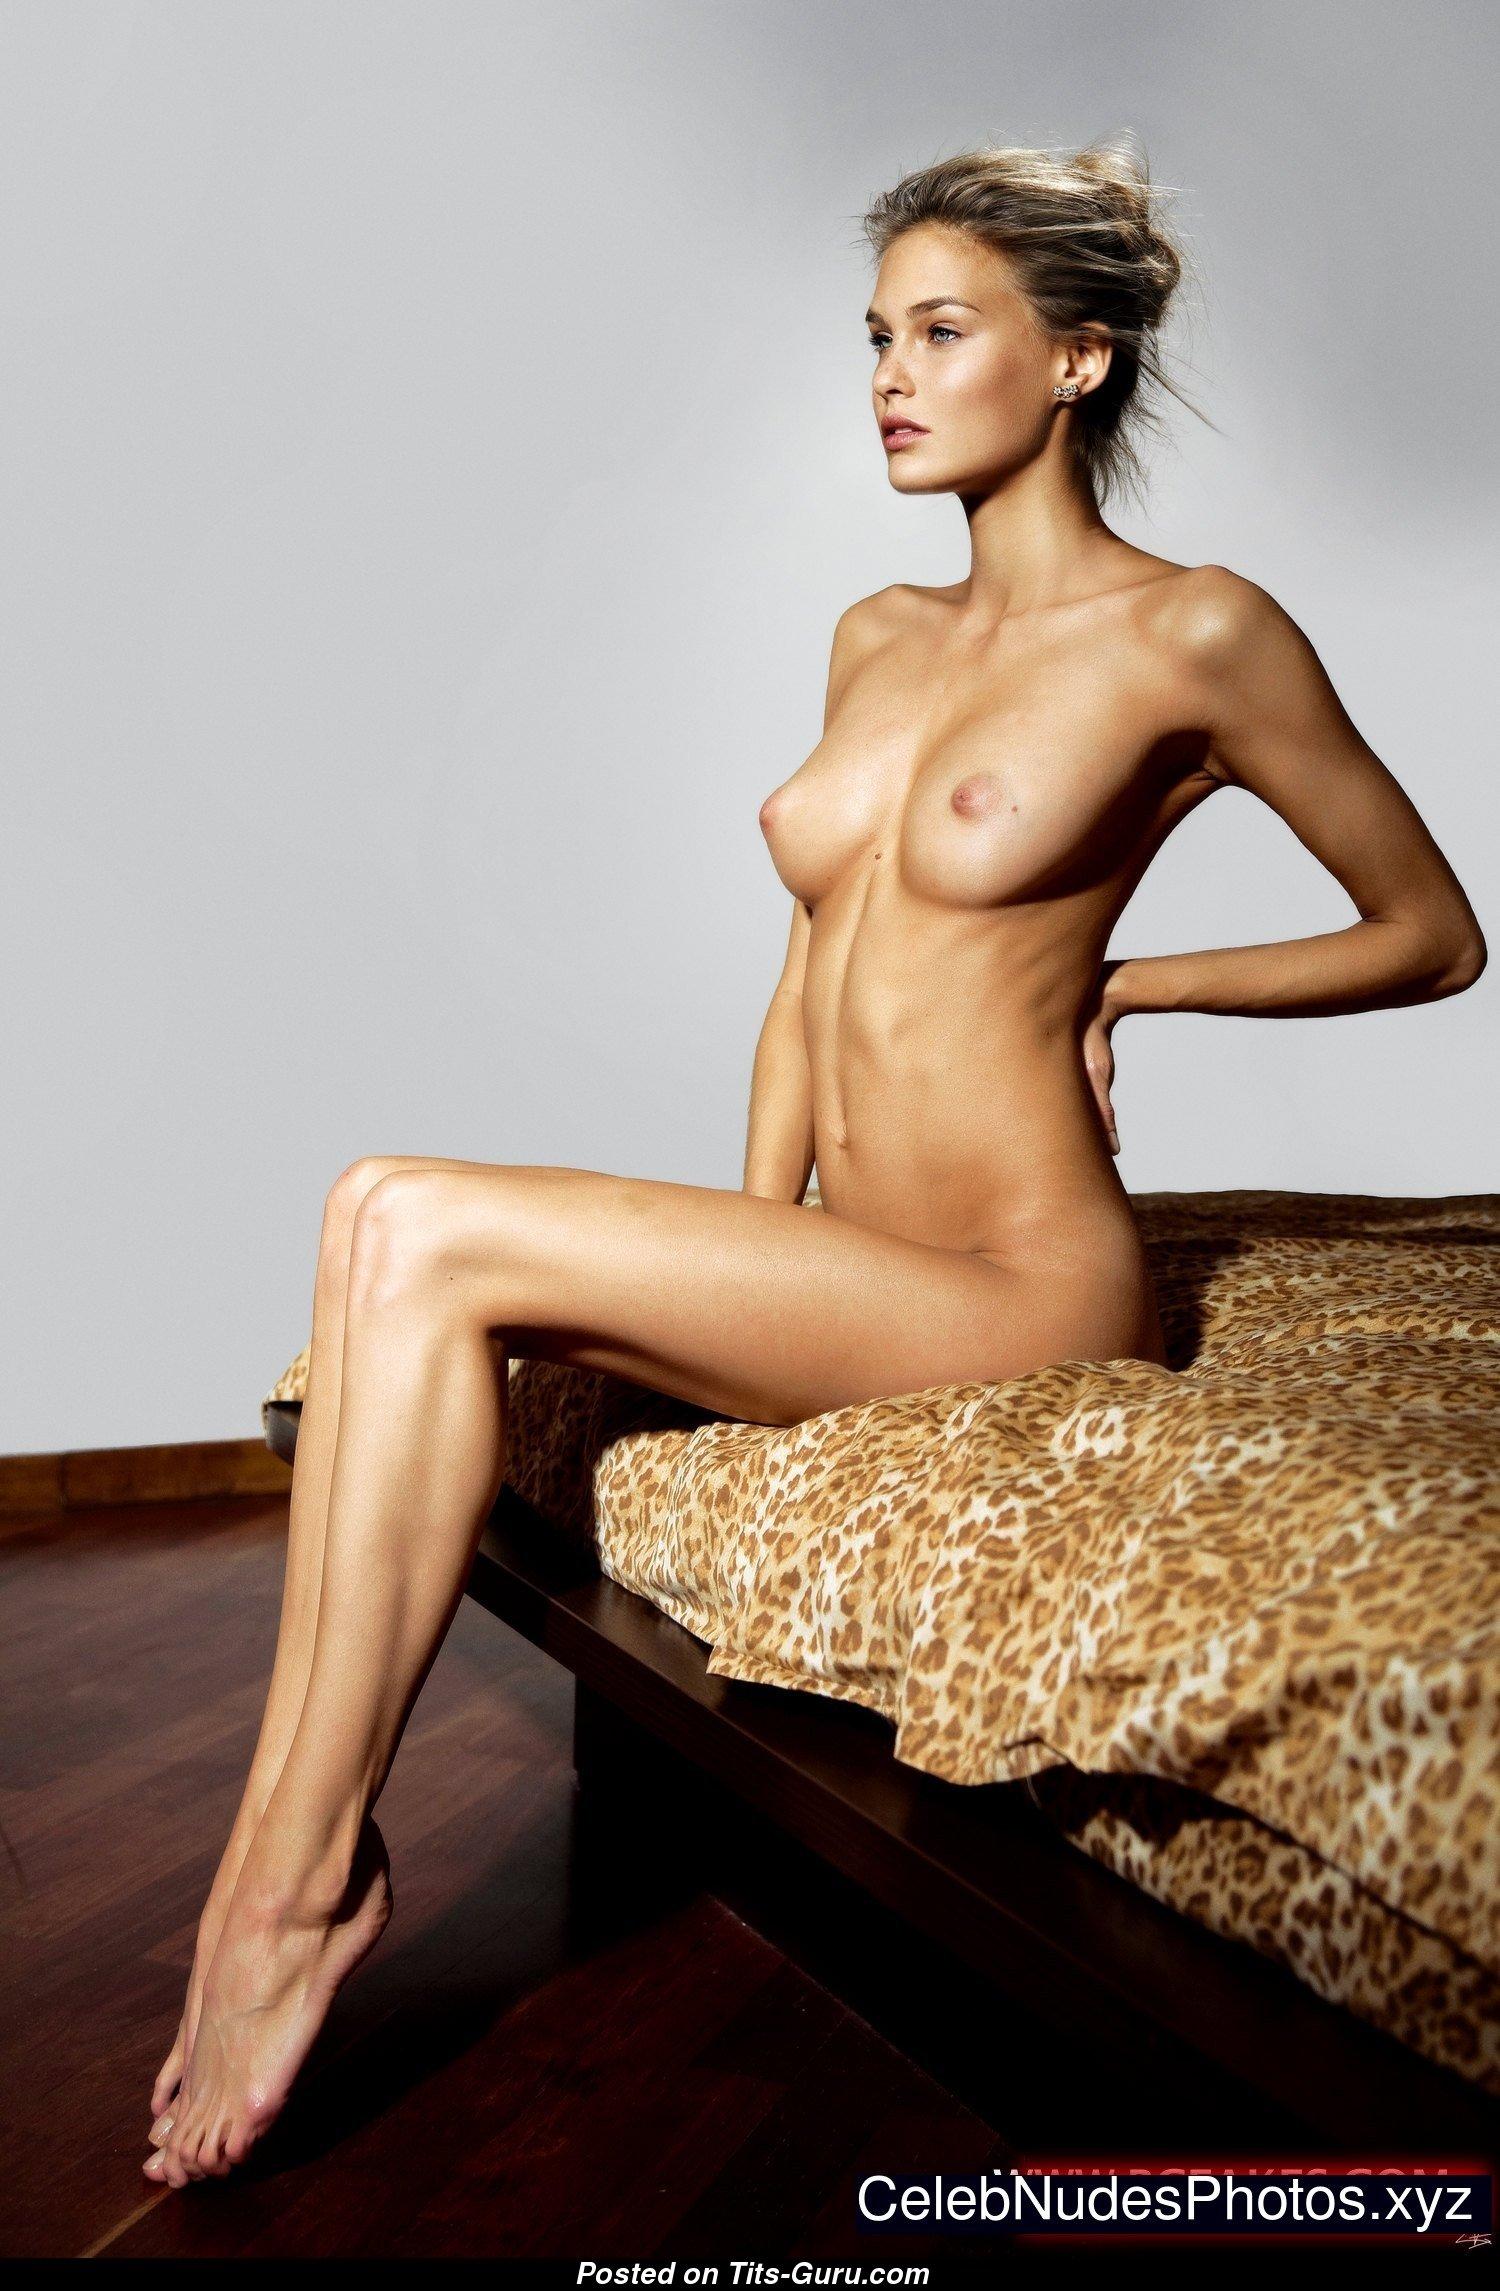 Bar Refaeli - Blonde Babe With Defenseless Real Boobie Sex Pic 08072018 210739-1762